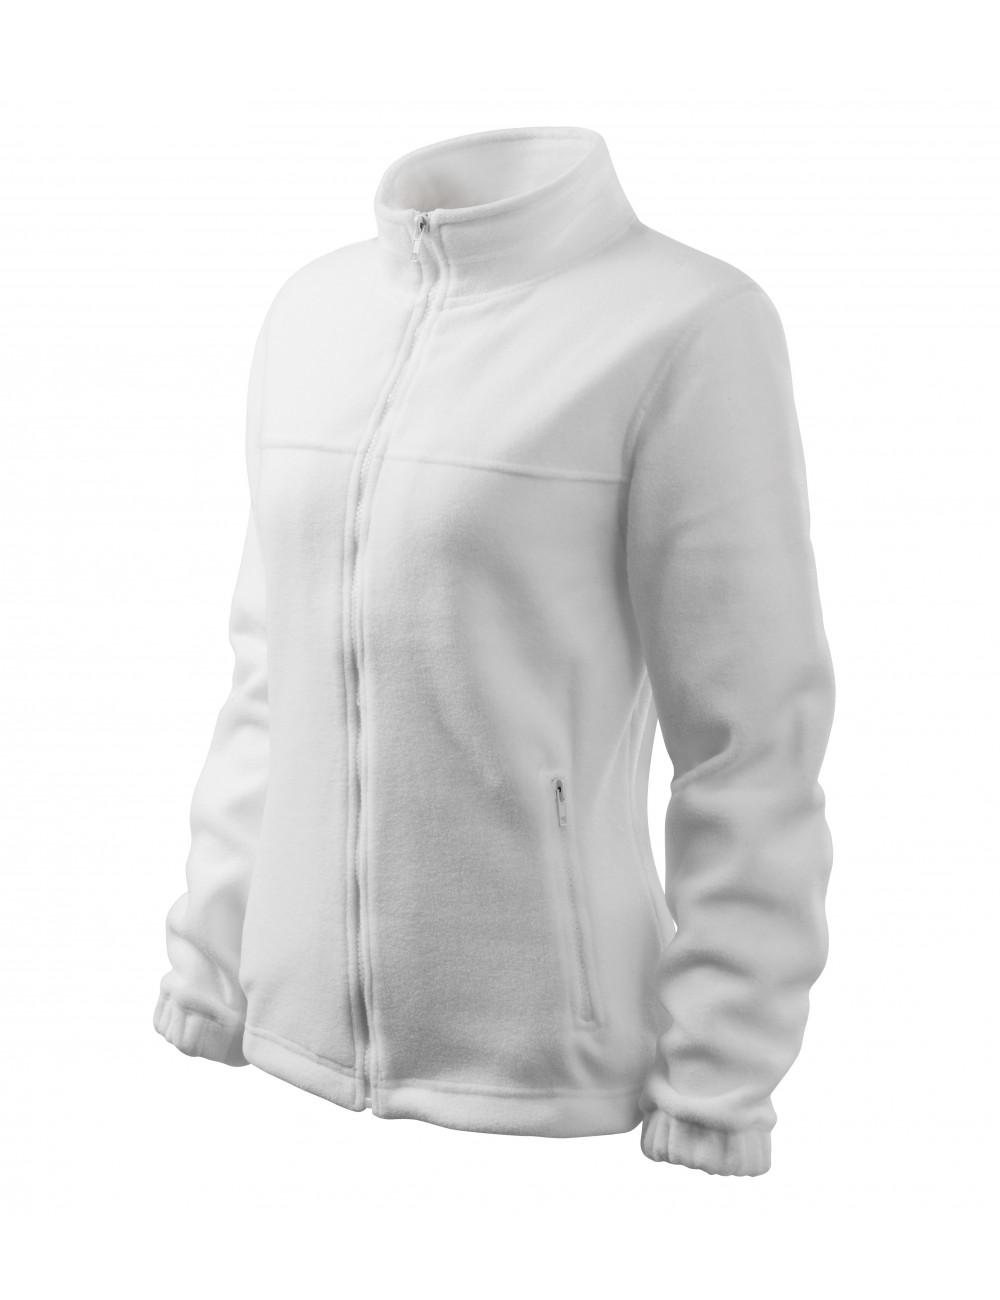 Adler RIMECK Polar damski Jacket 504 biały